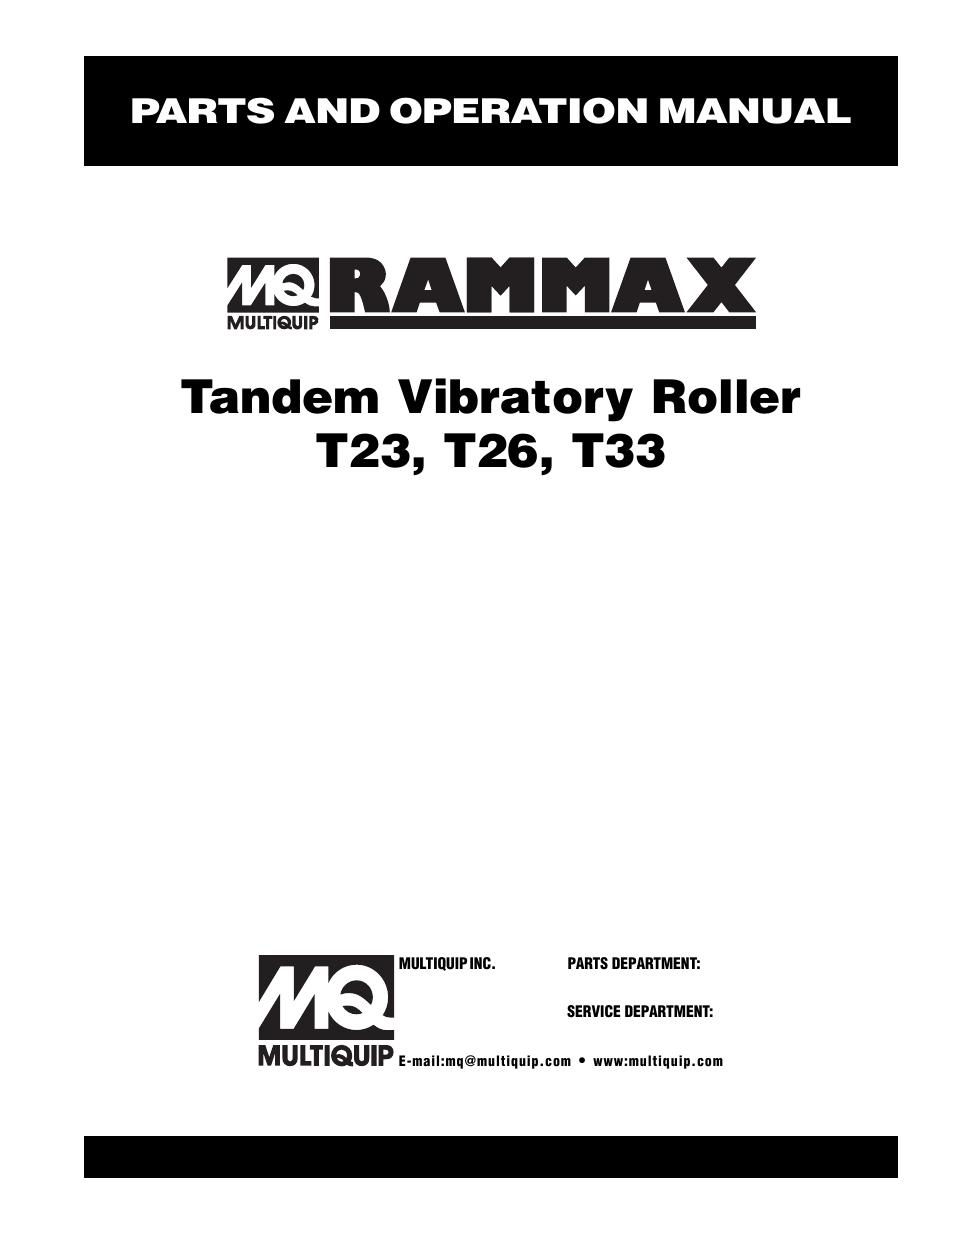 Multiquip Rammax Tandem Vibratory Roller T23 User Manual